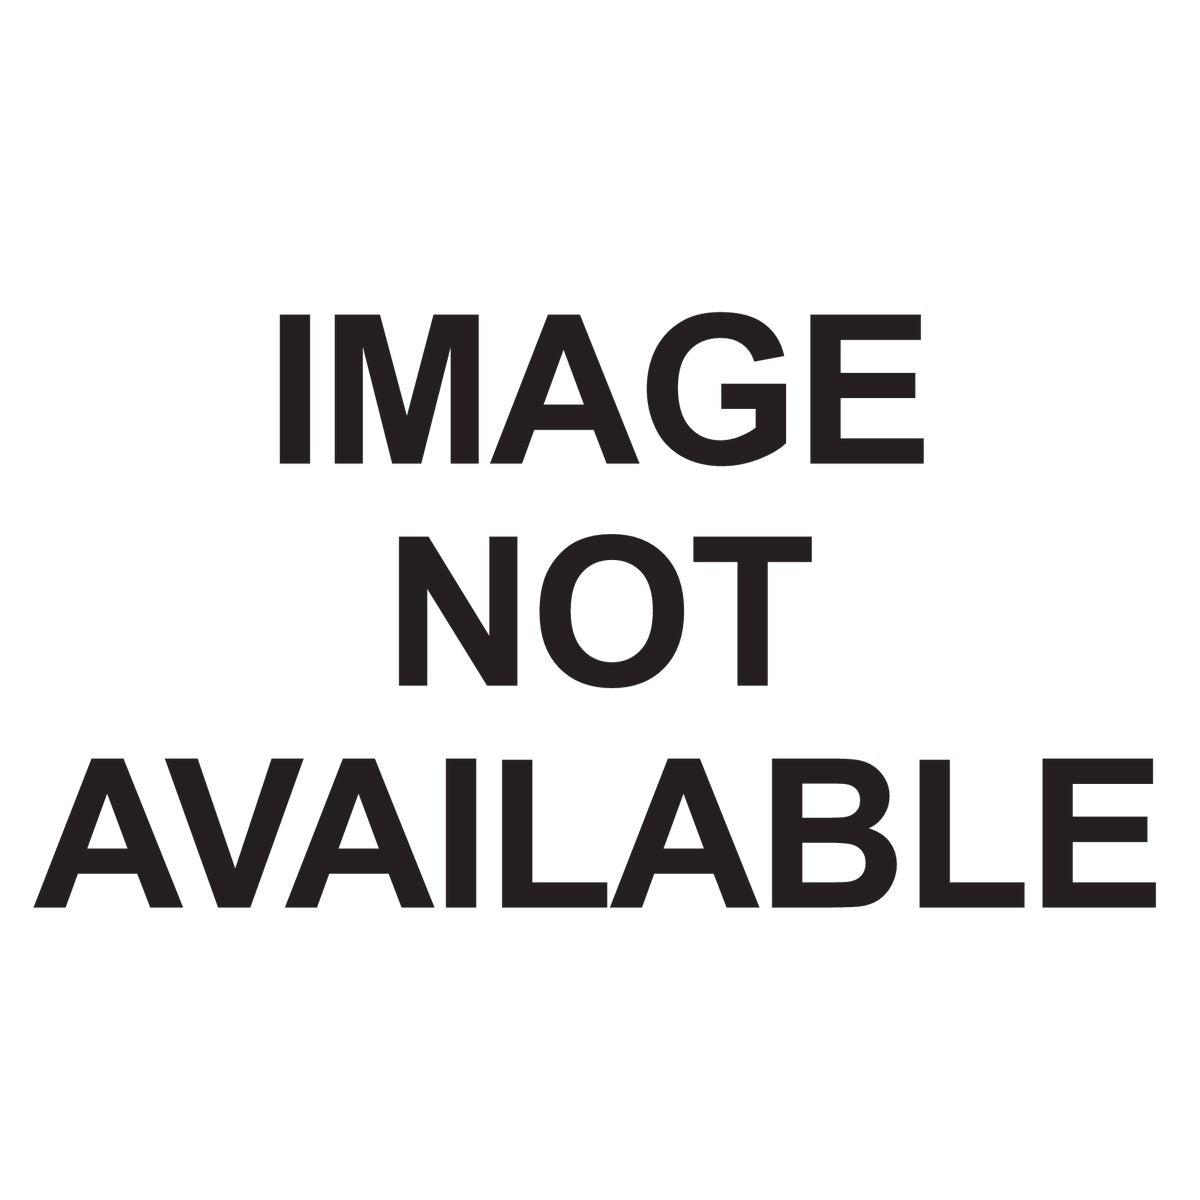 GYRO CRDLS SCREWDRIVER - BDCS40G by Black & Decker